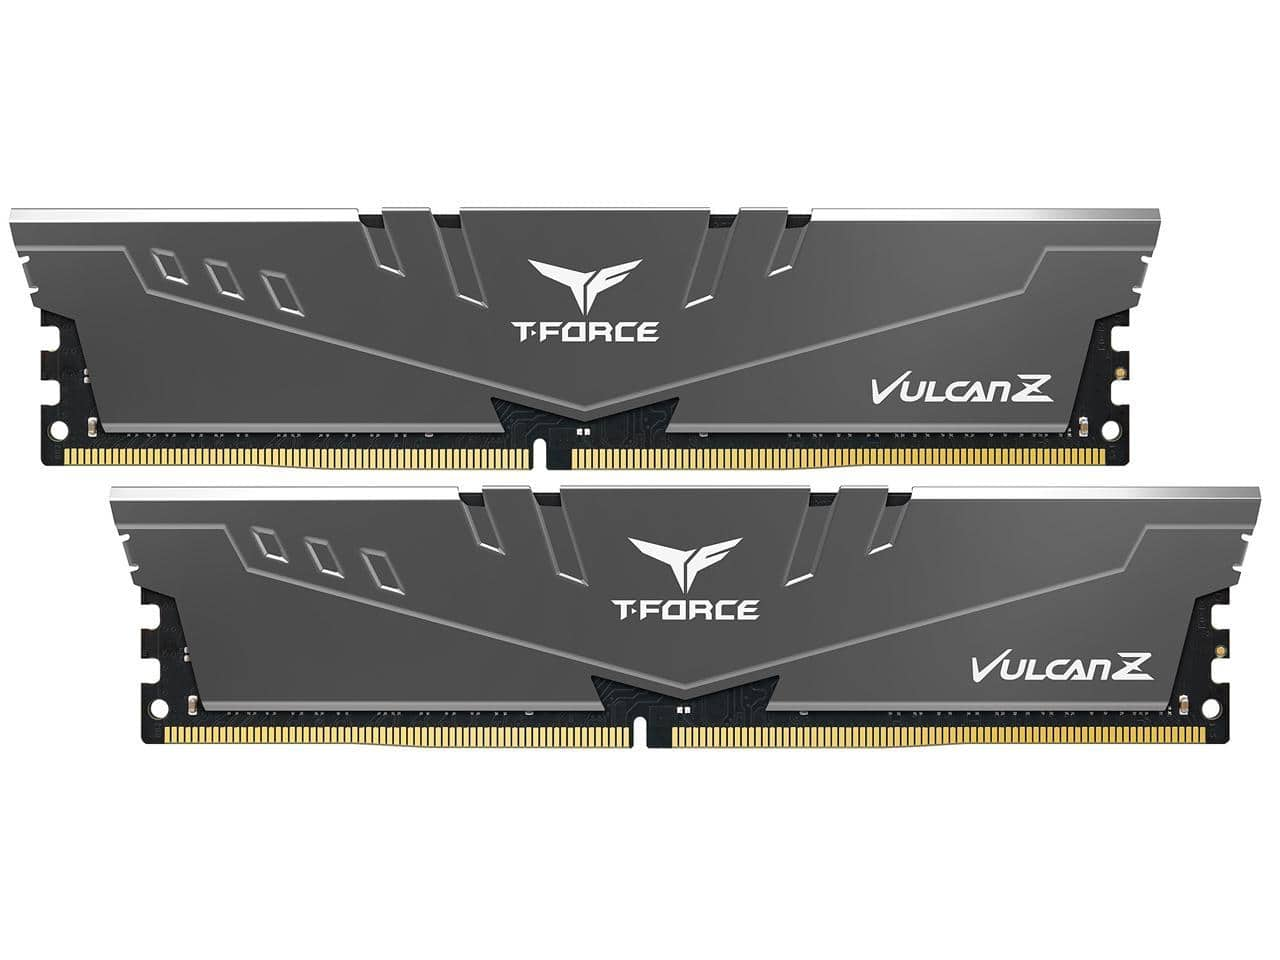 TEAMGROUP T-Force Vulcan Z DDR4 16GB Kit (2 x 8GB) 3200MHz (PC4 25600) CL16 Desktop Memory Module Ram - Gray / Red Free Shipping @Amazon.com / Newegg.com $54.99